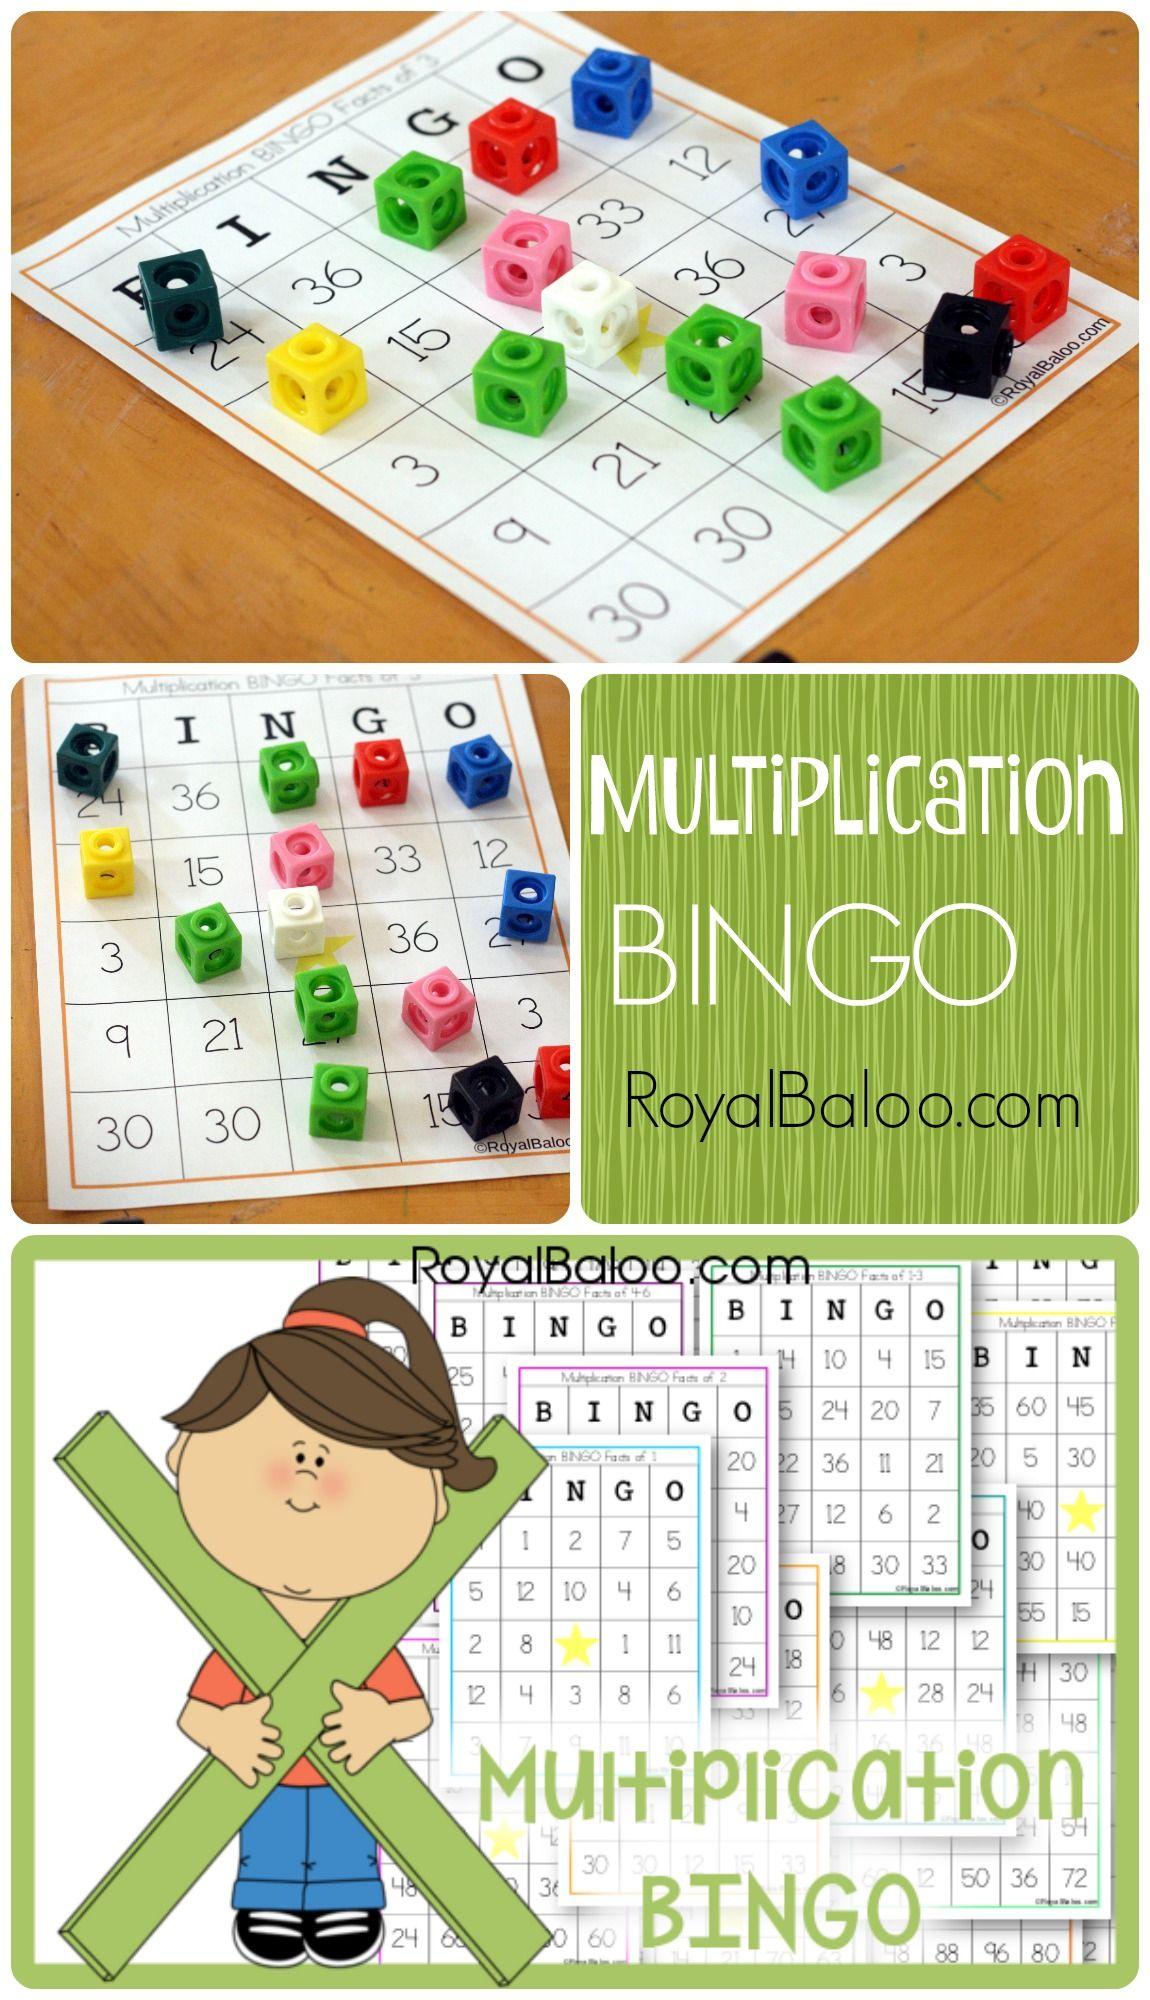 Multiplication Bingo Cards